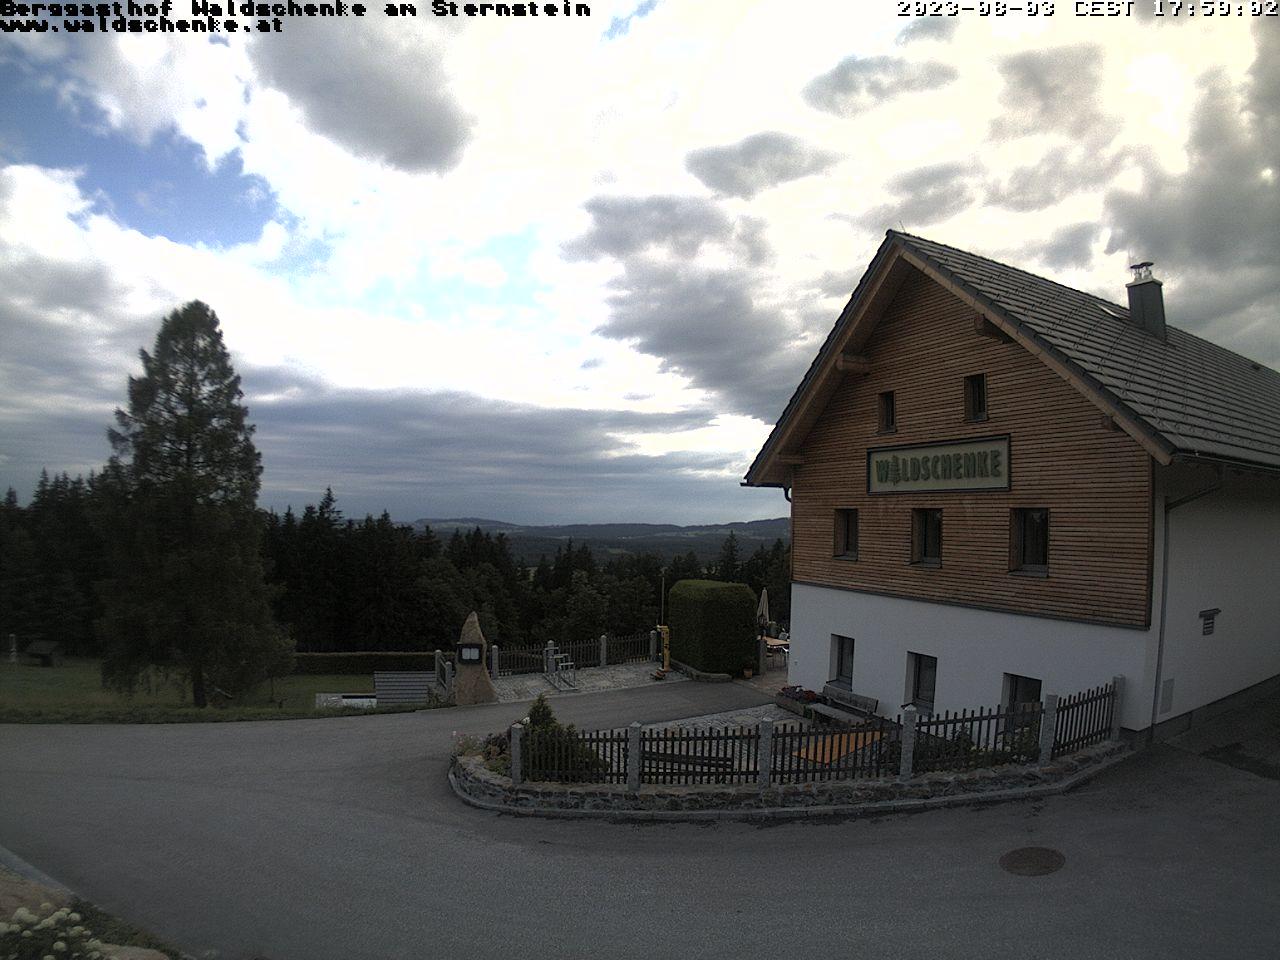 Webcam Waldschenke